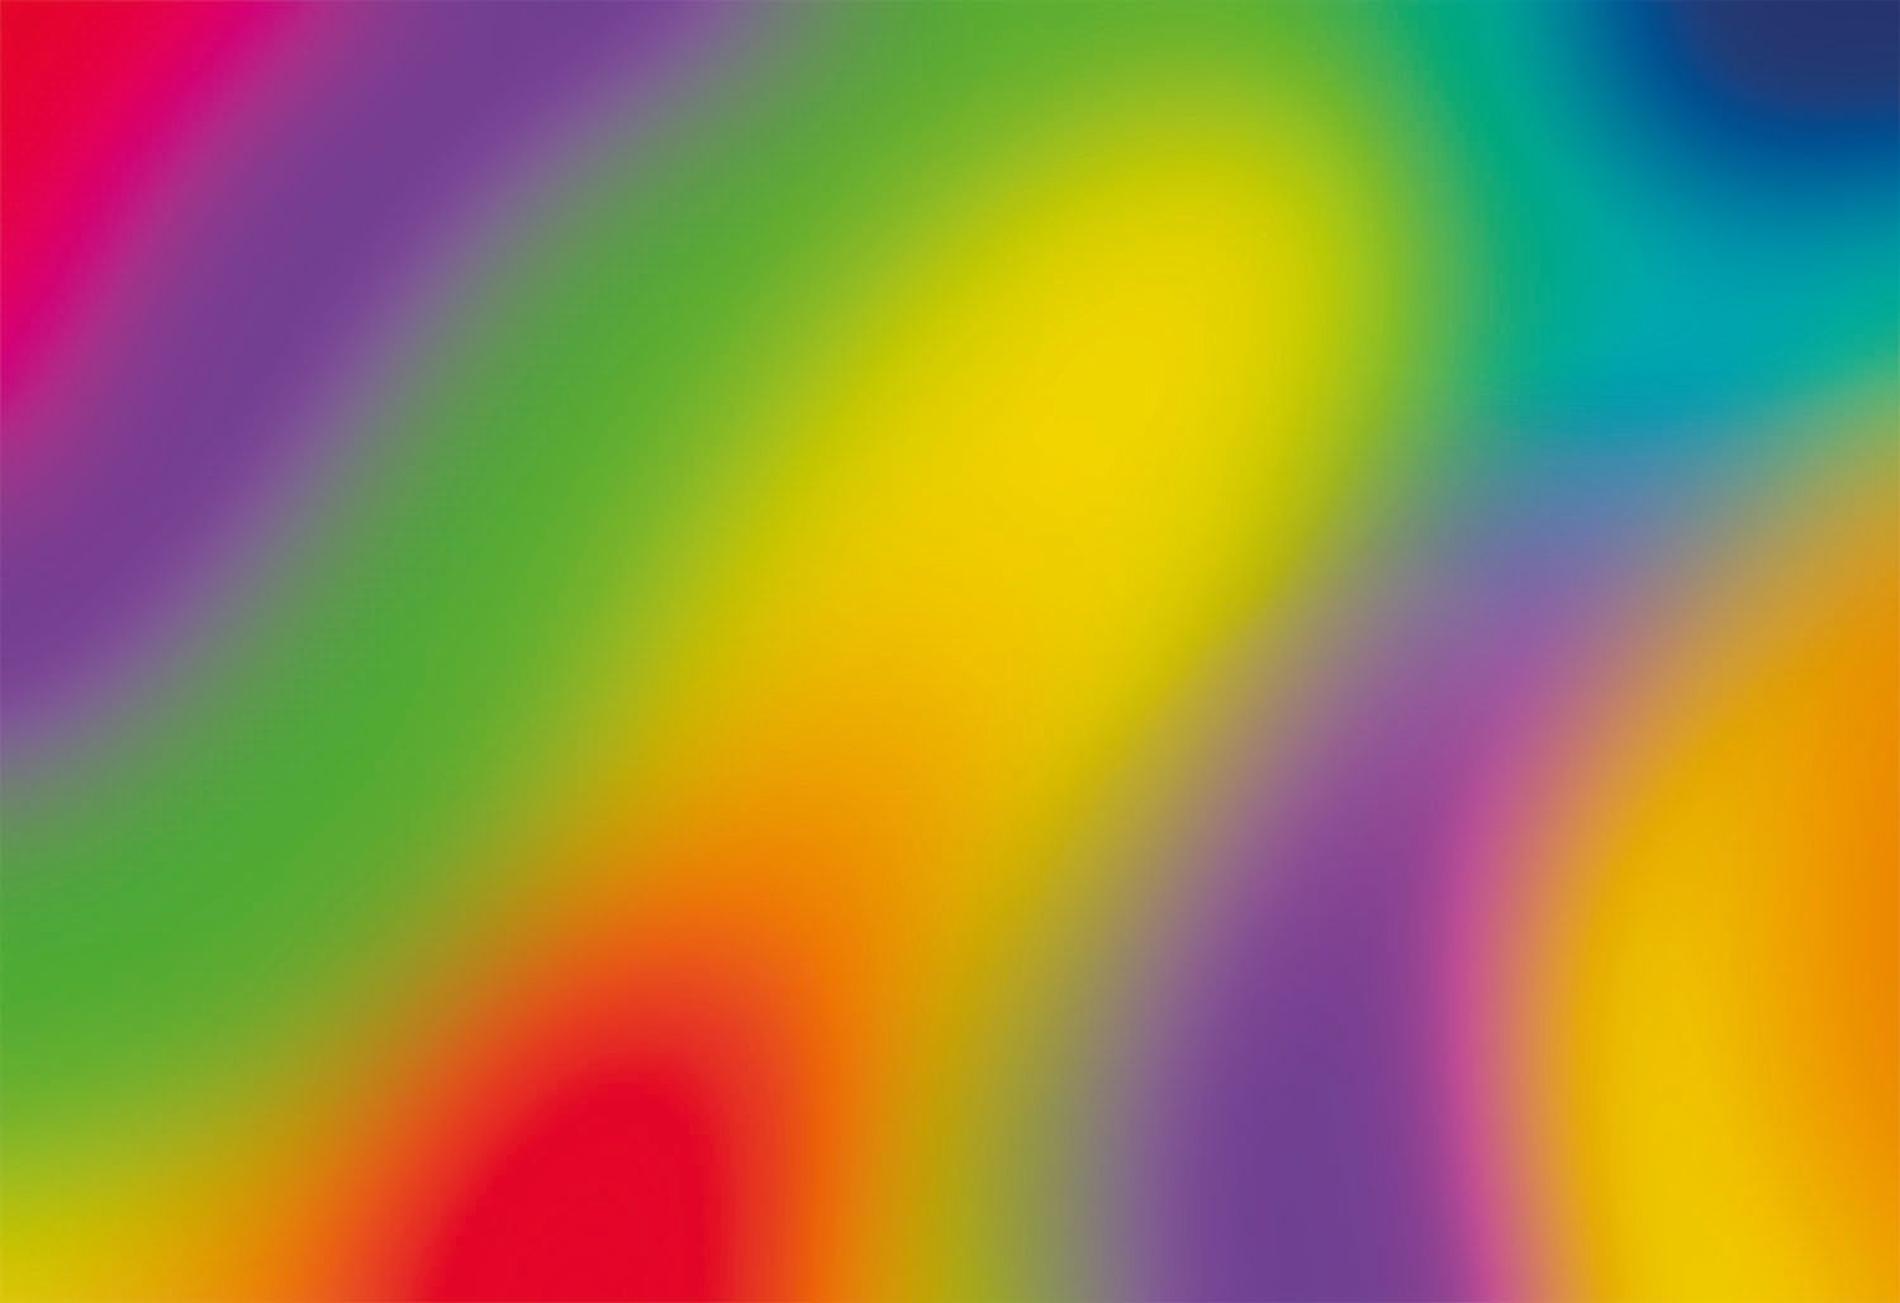 Gradient Graphics / Illustration Jigsaw Puzzle